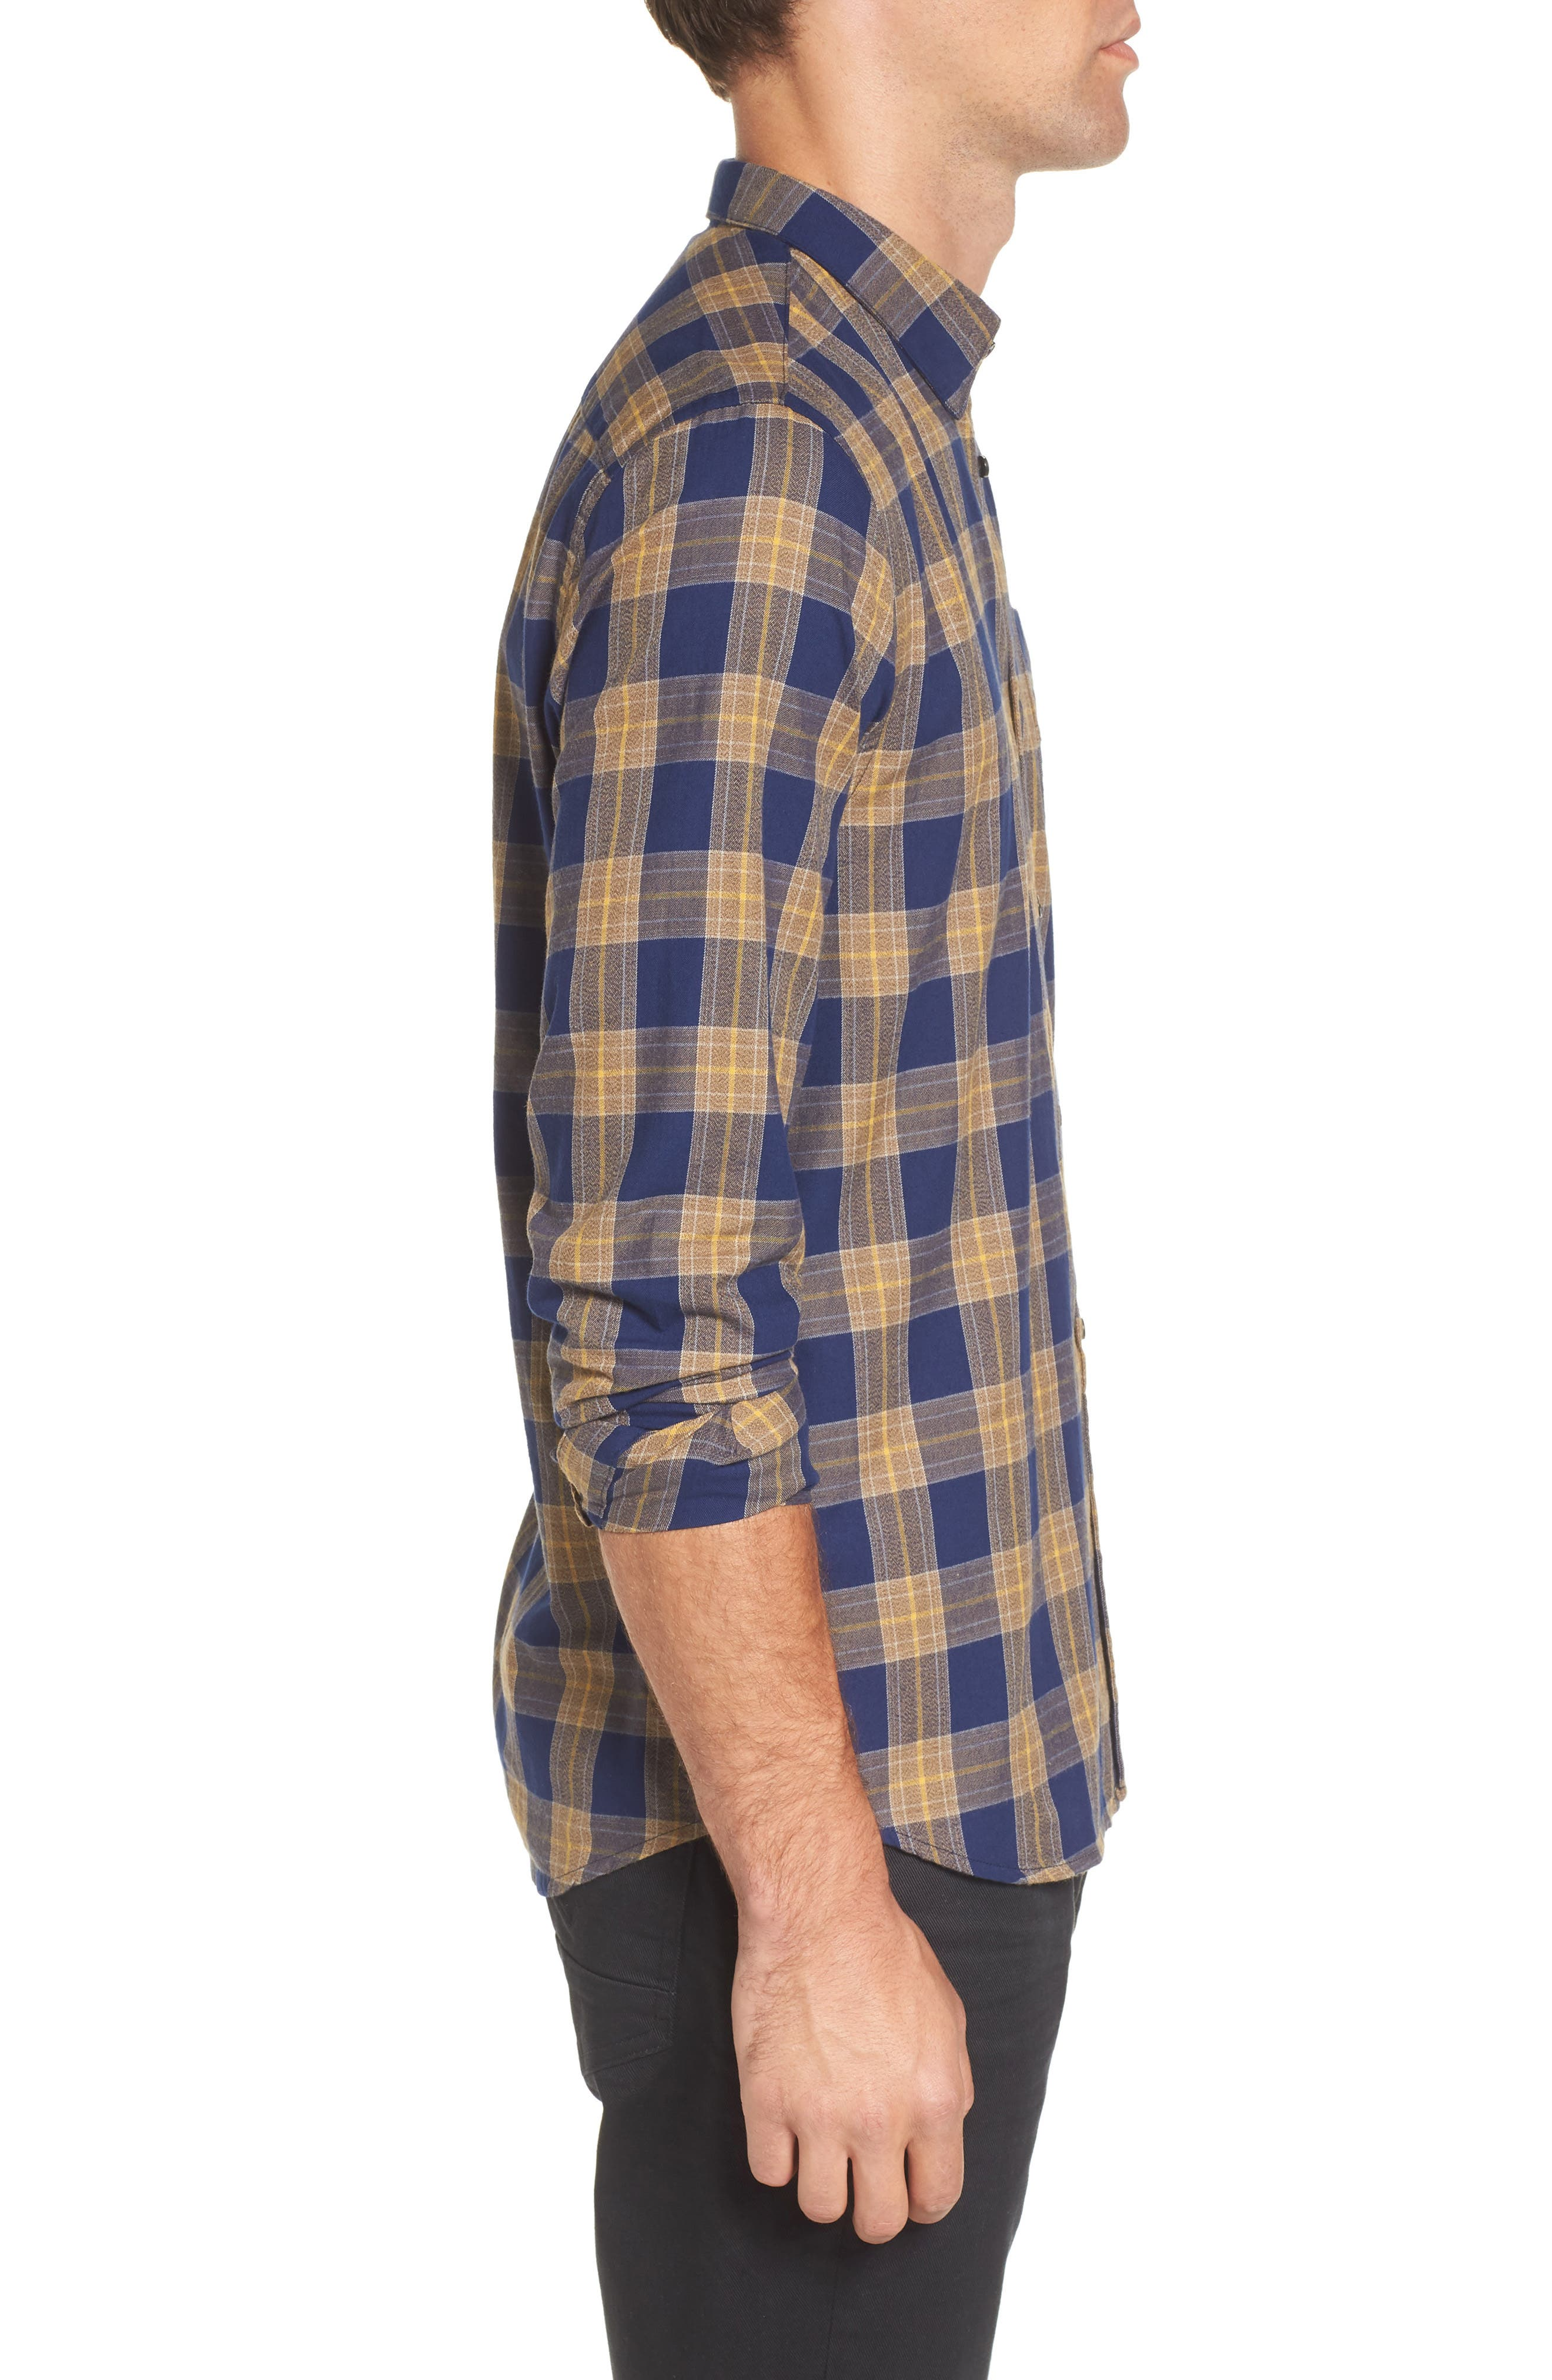 Scotch & Sode Brushed Cotton Shirt,                             Alternate thumbnail 3, color,                             Blue